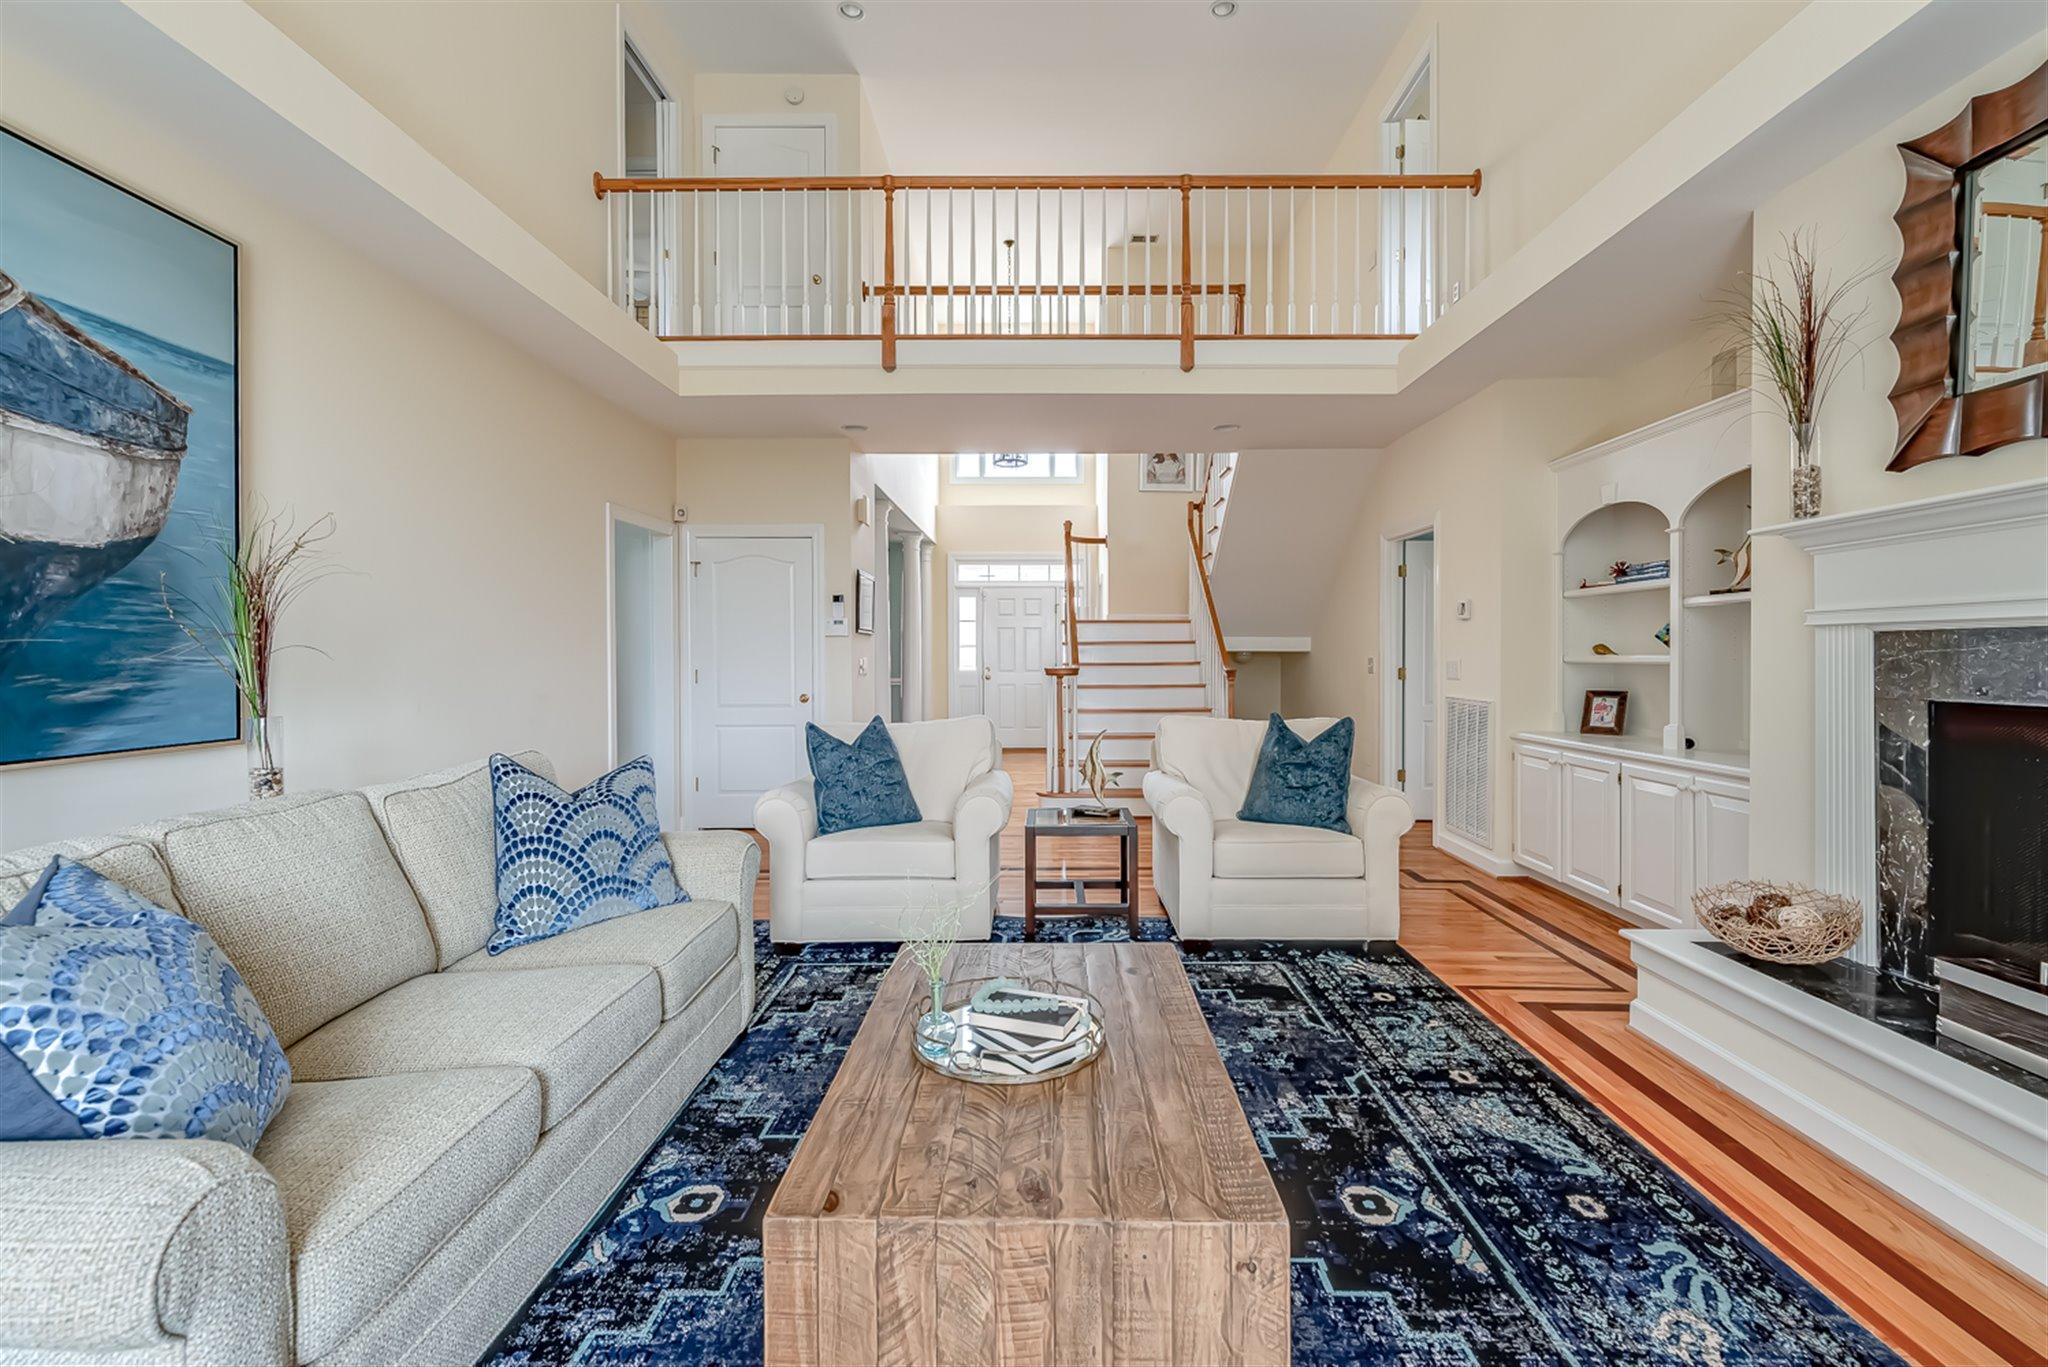 Indigo Point Homes For Sale - 50 Indigo Point, Charleston, SC - 34